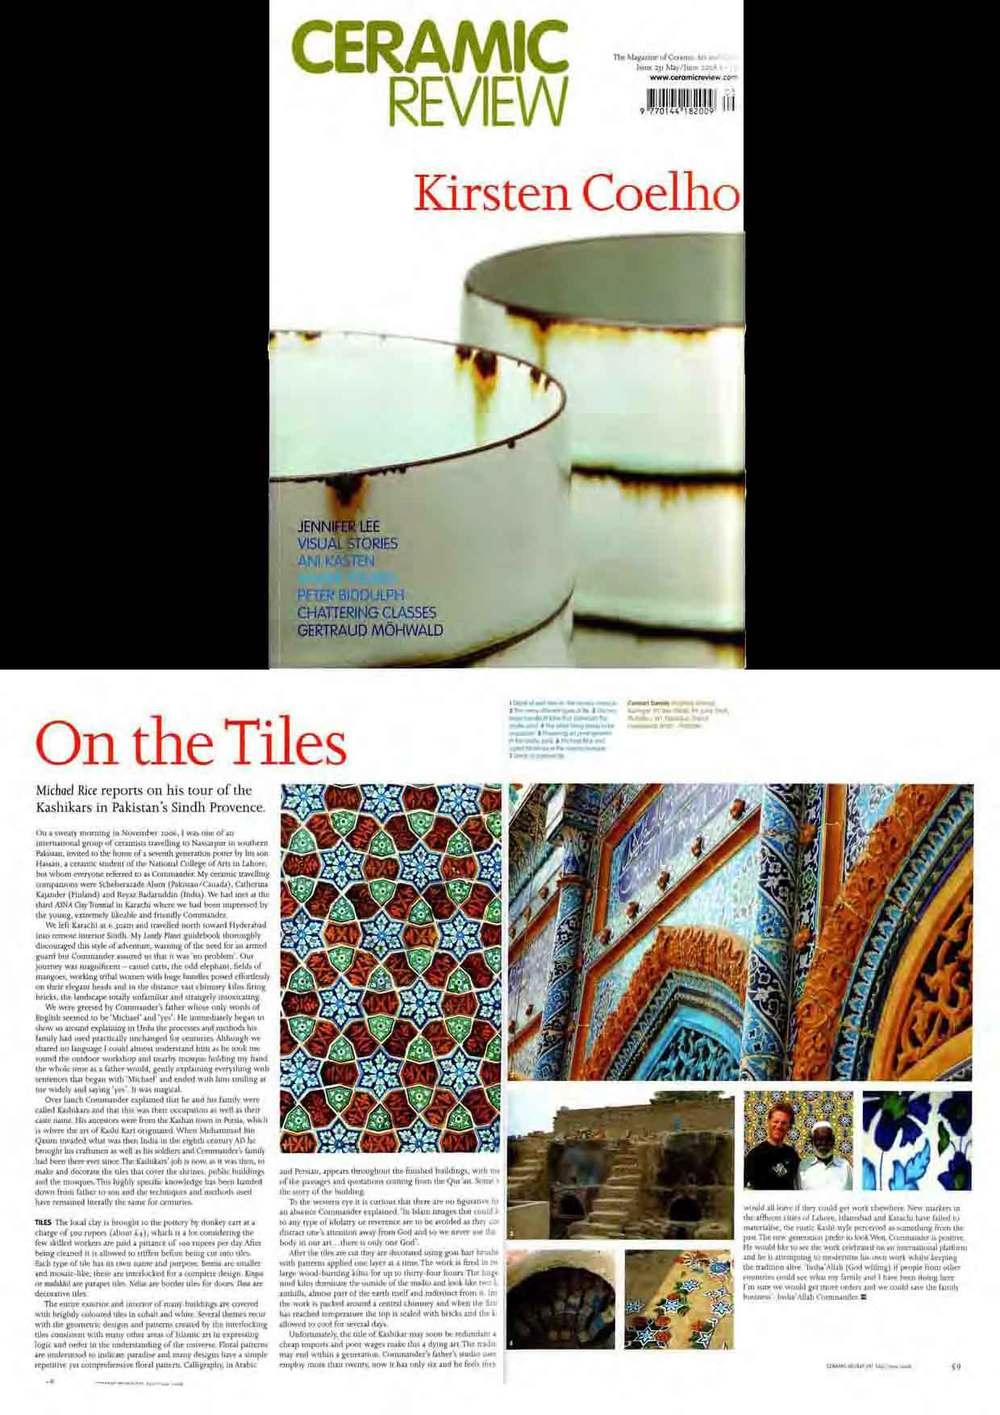 Ceramic Review article 2008